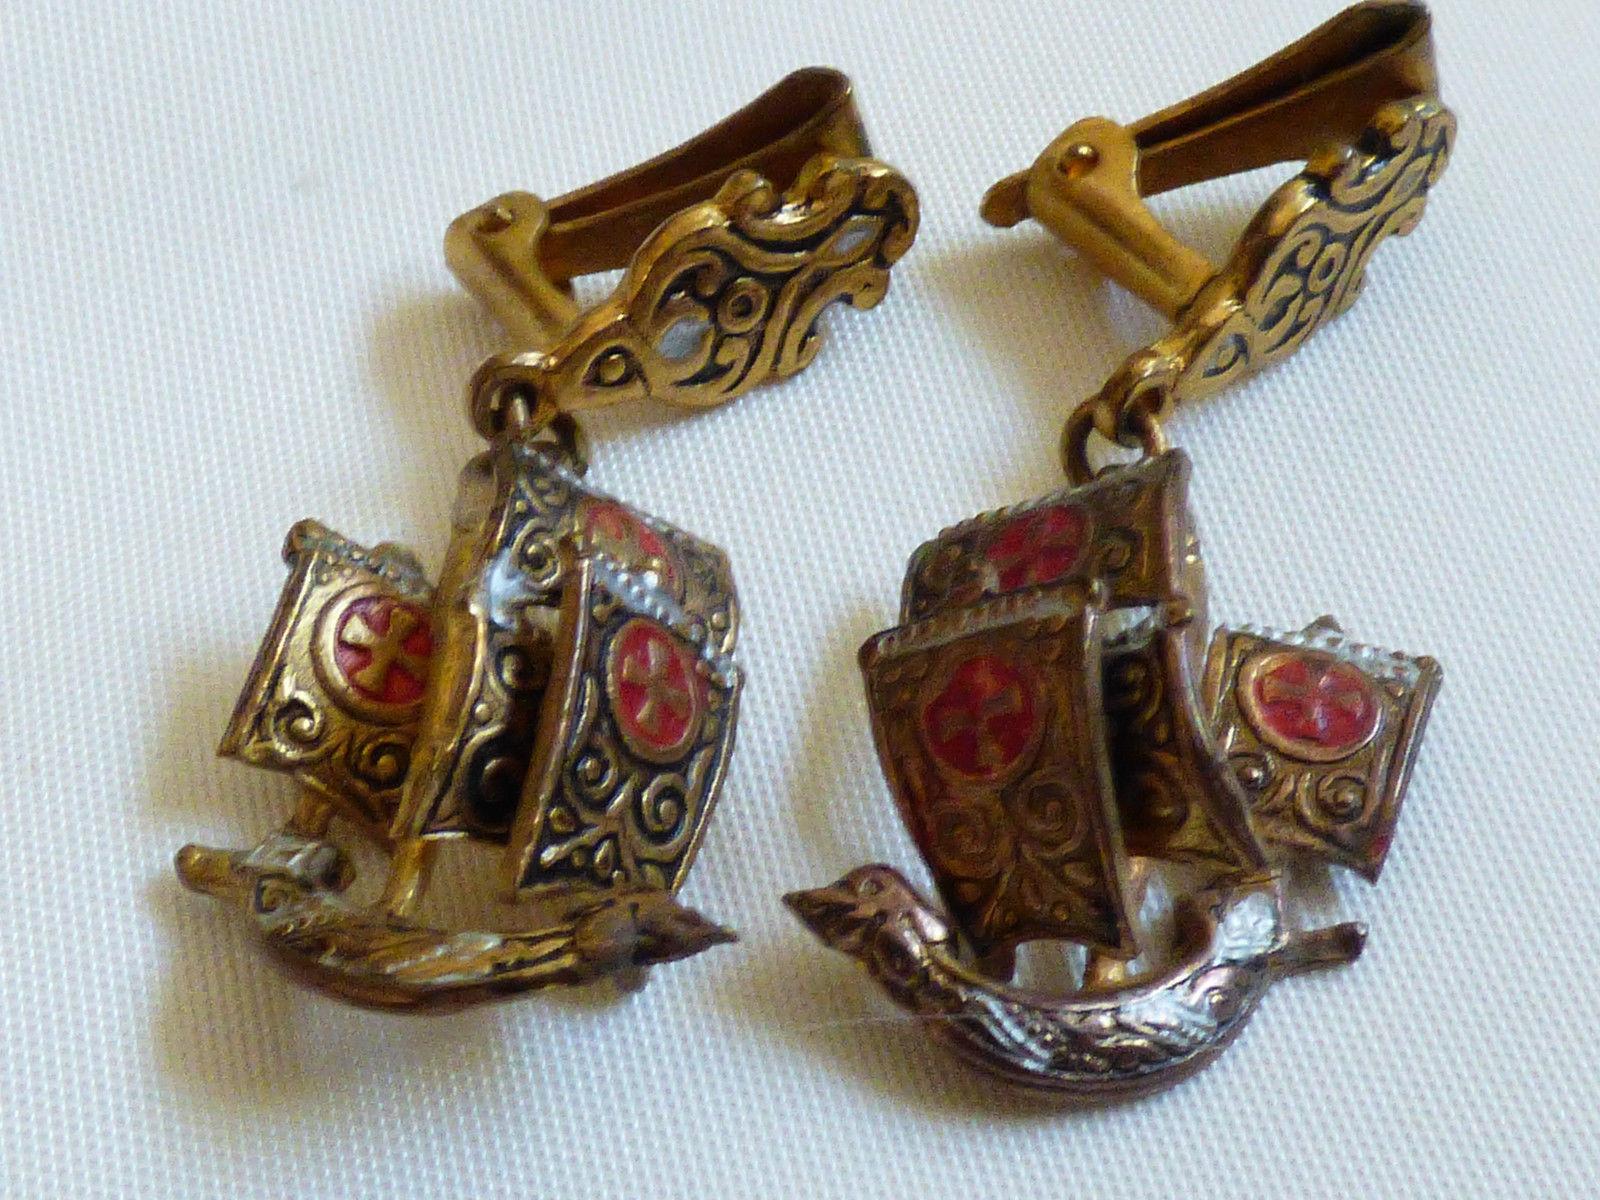 b4f6186dd VTG Spain Damascene Gold inlay Sail Ship and 50 similar items. S l1600